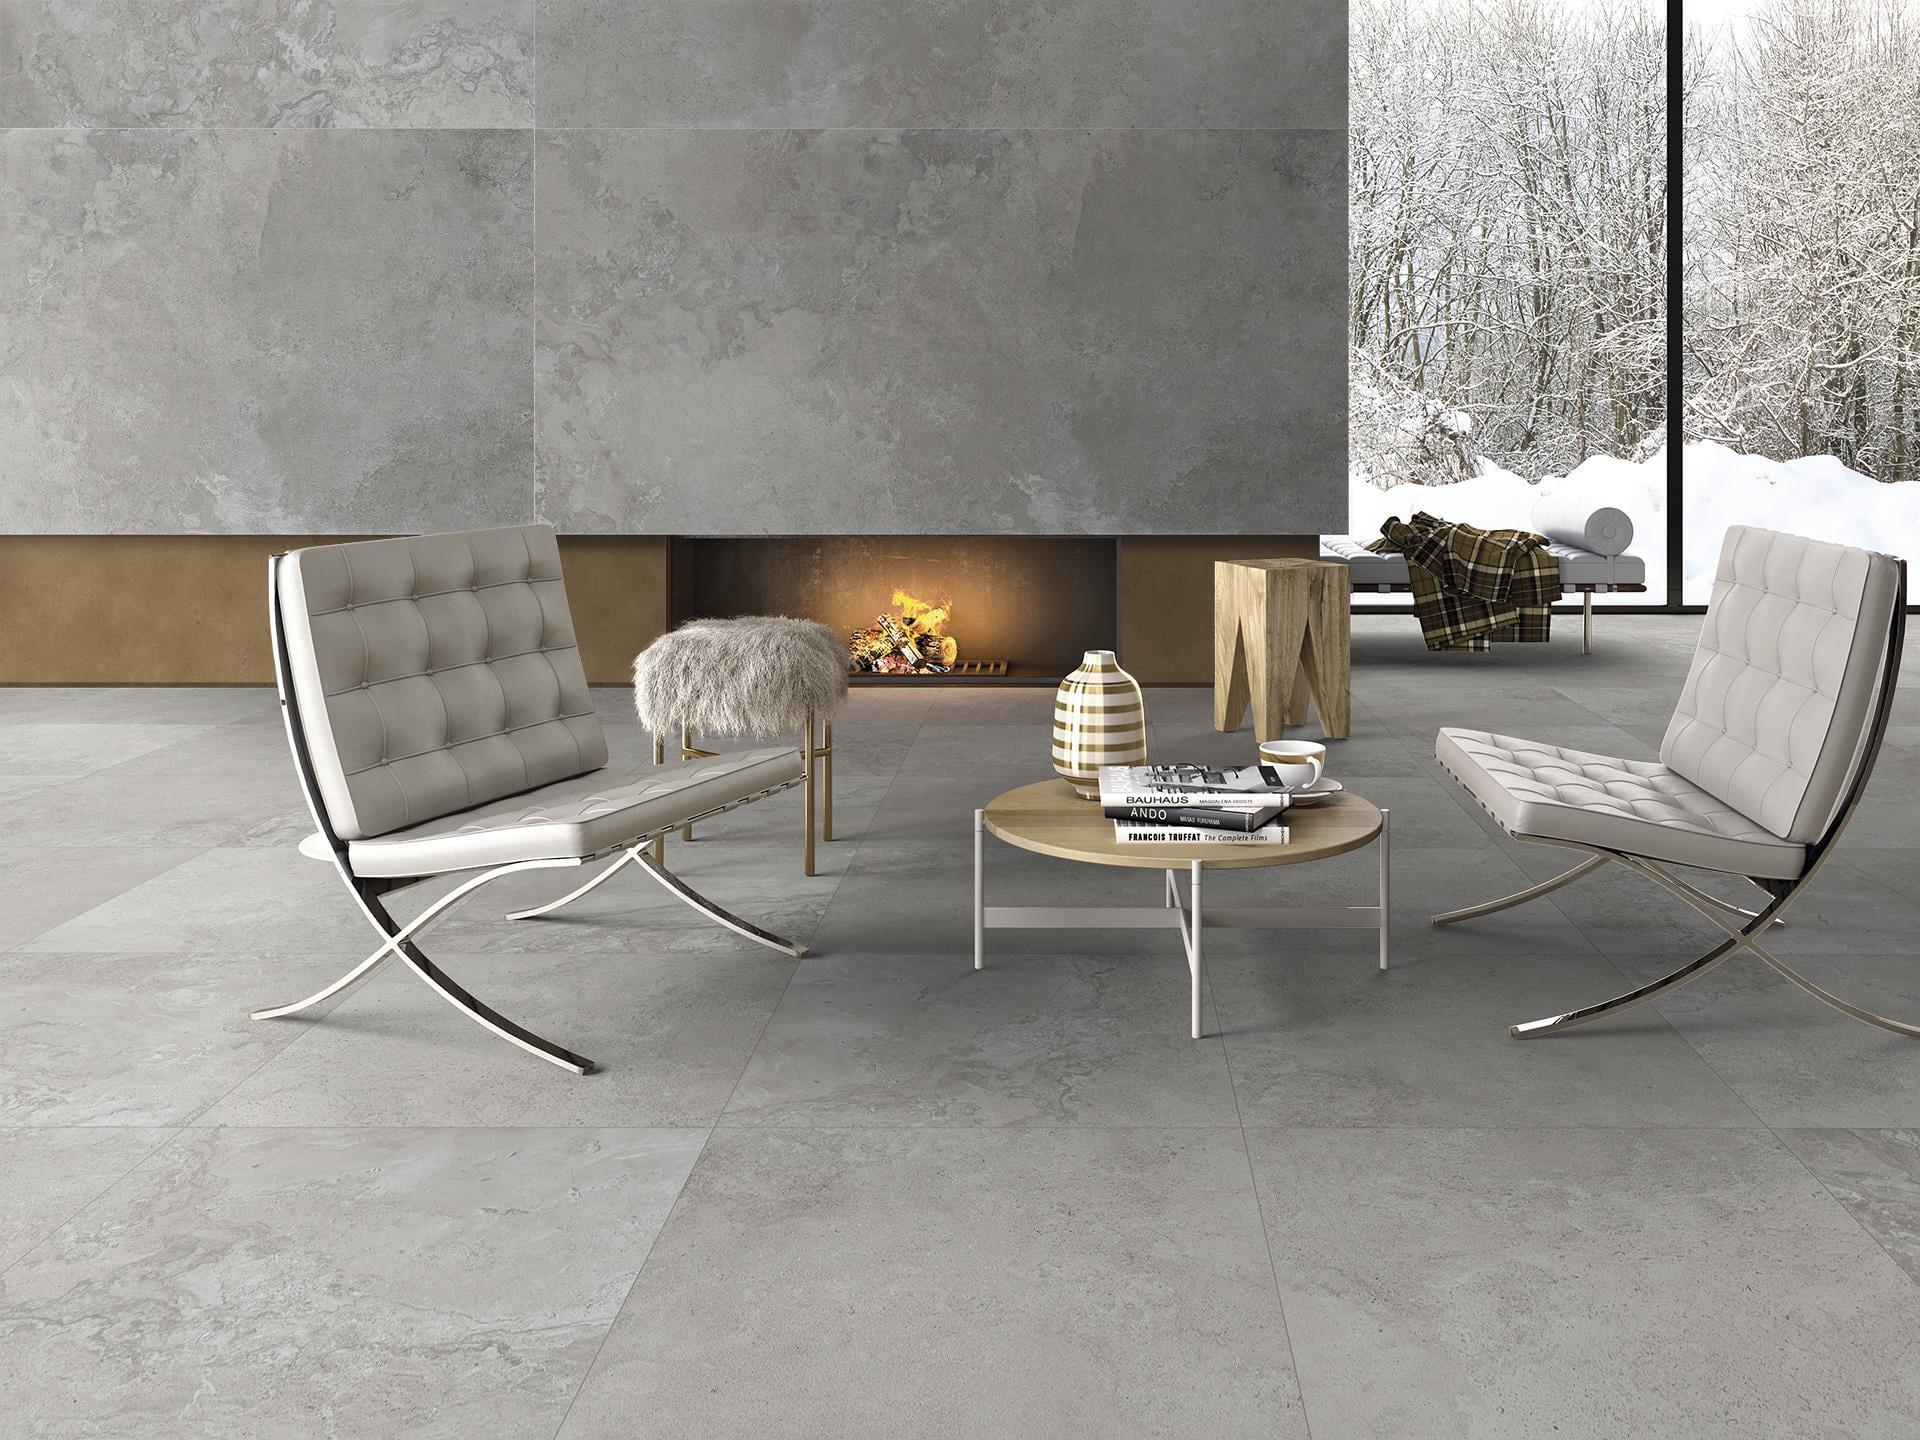 Tuintegels Terrastegels 80x80 Terrastegels.Rock Slabs Grey 80x80 Keramische Tegels